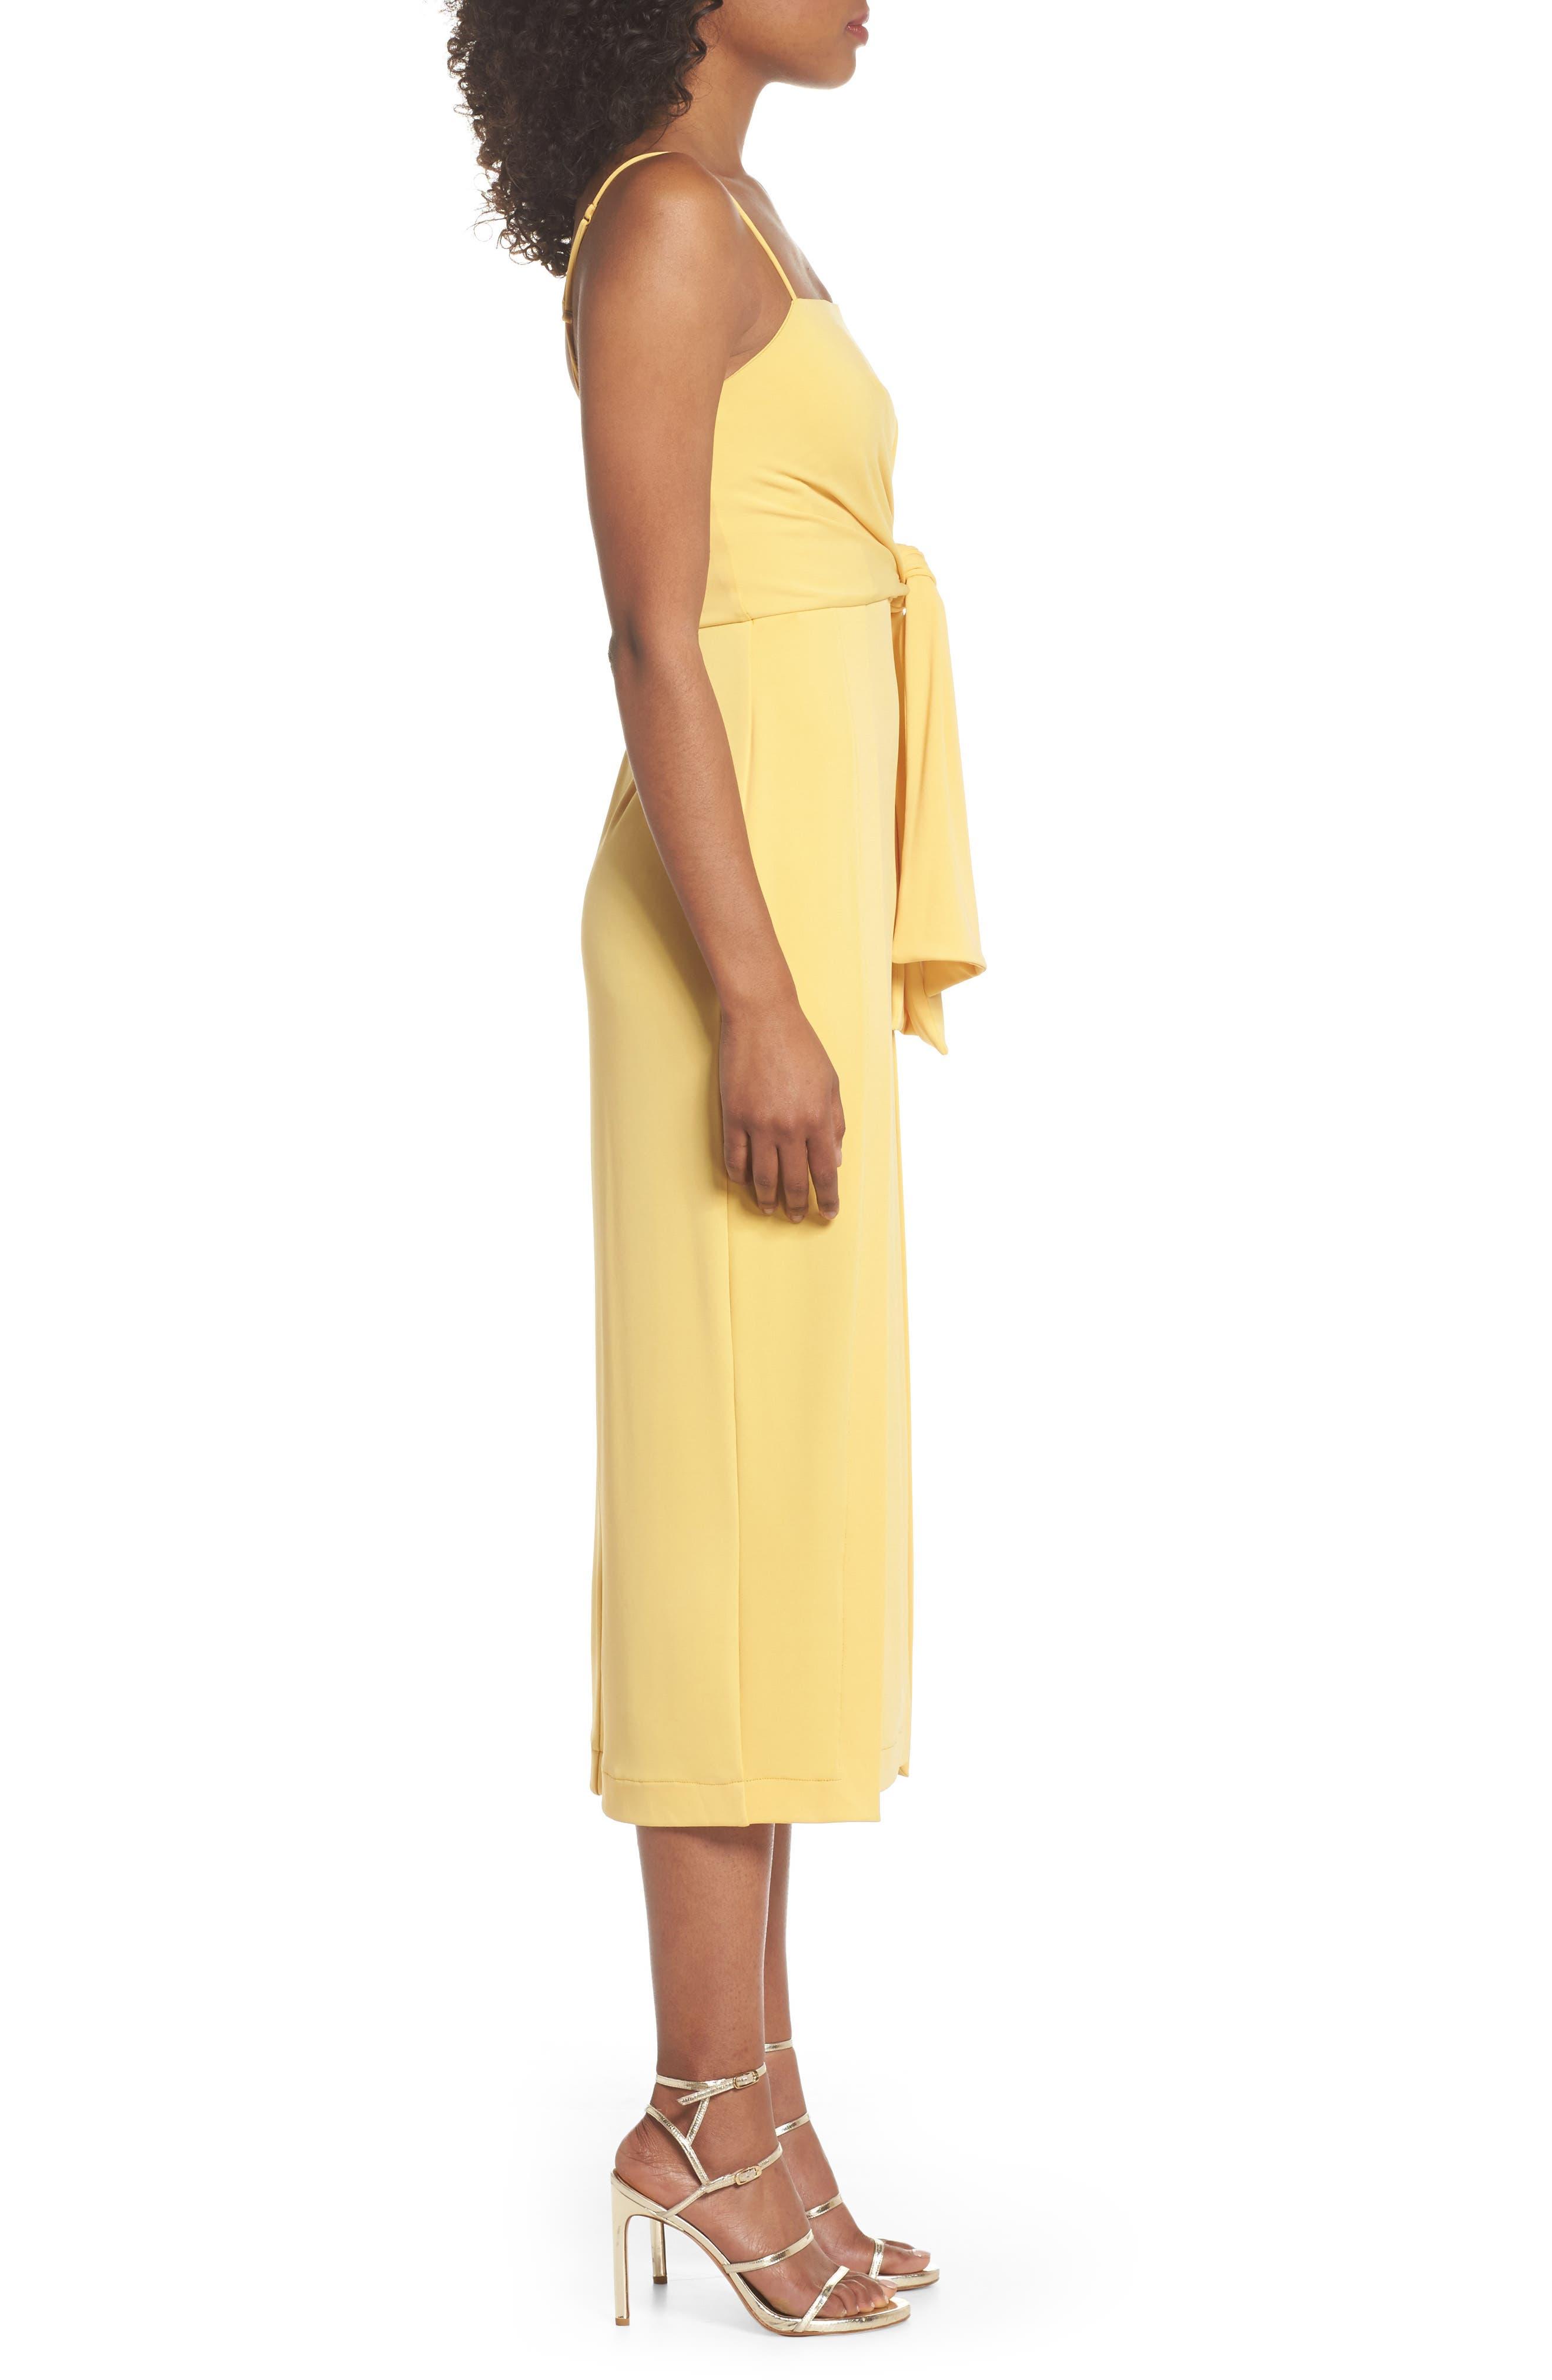 Recollect Slinky Side Tie Midi Dress,                             Alternate thumbnail 3, color,                             Honey